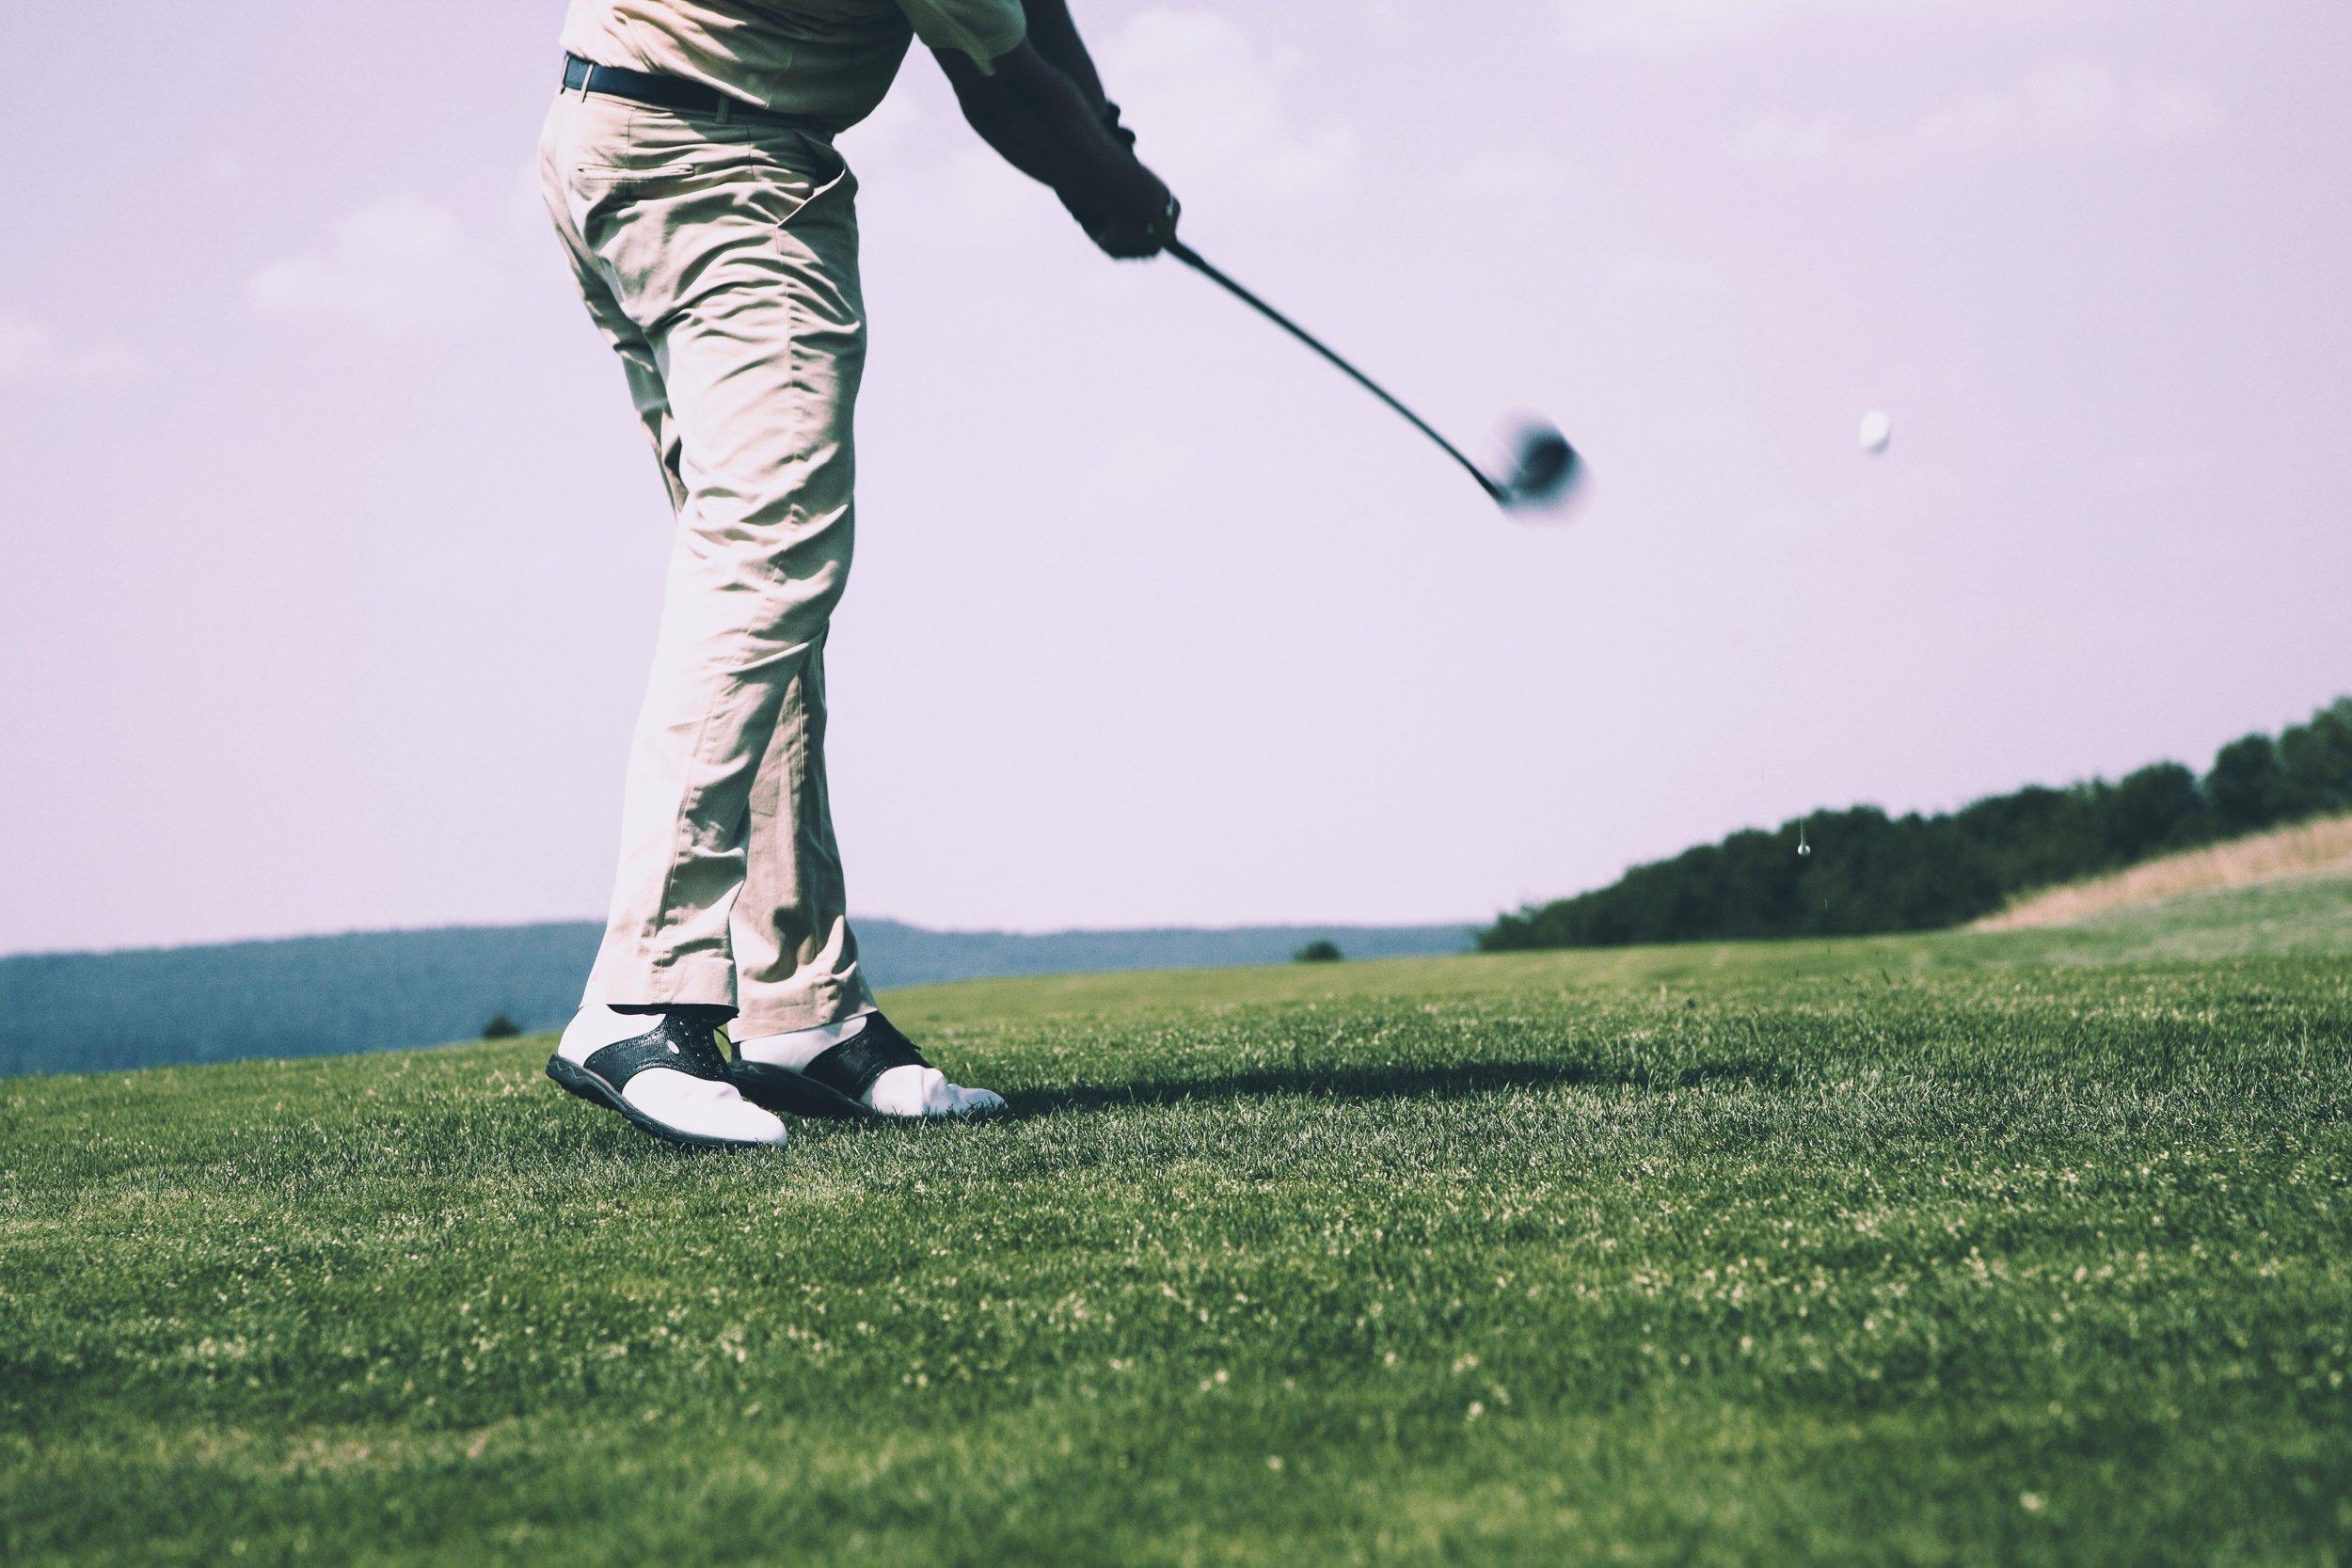 golf-golf-ball-golf-club-114972.jpg